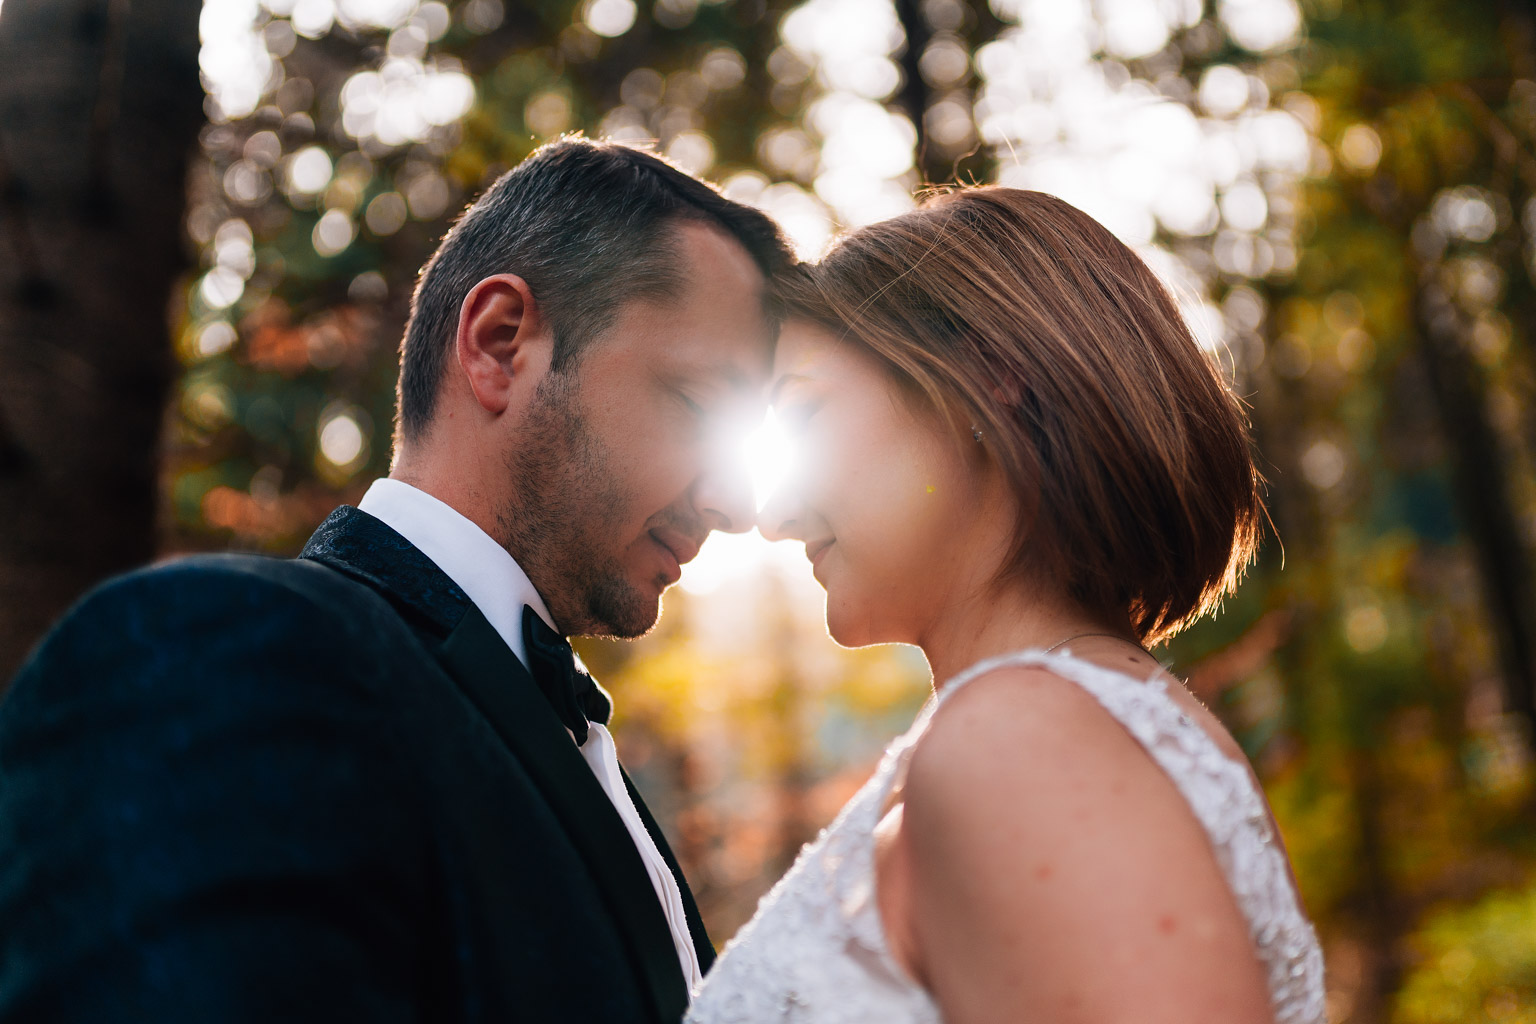 Cat timp sa aloci pentru sedinta foto de nunta si ce interval sa alegi?